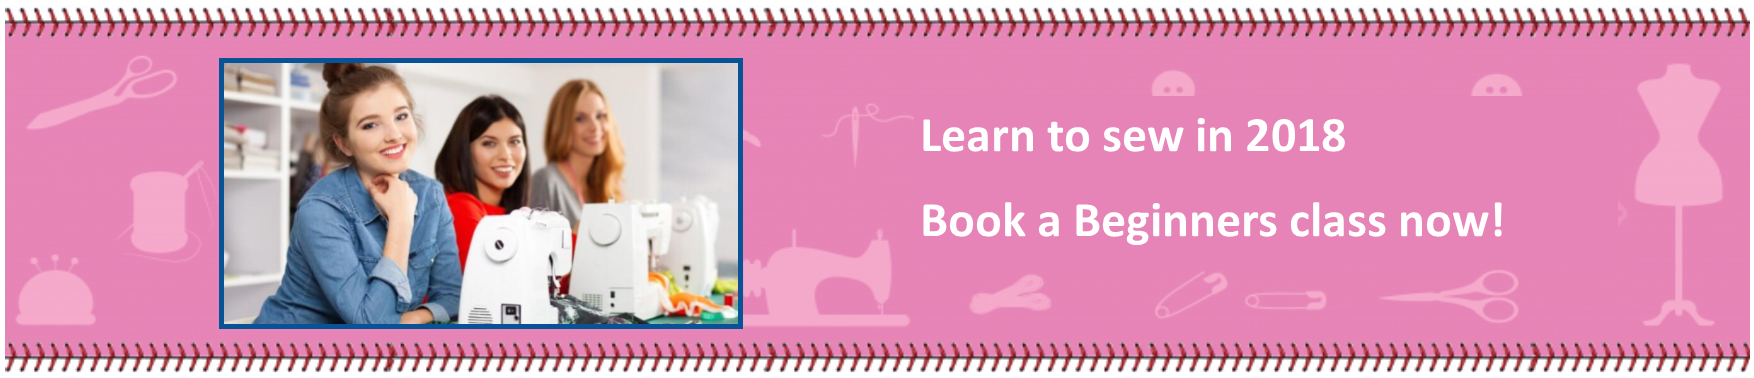 Sewing Classes & Creative Workshops